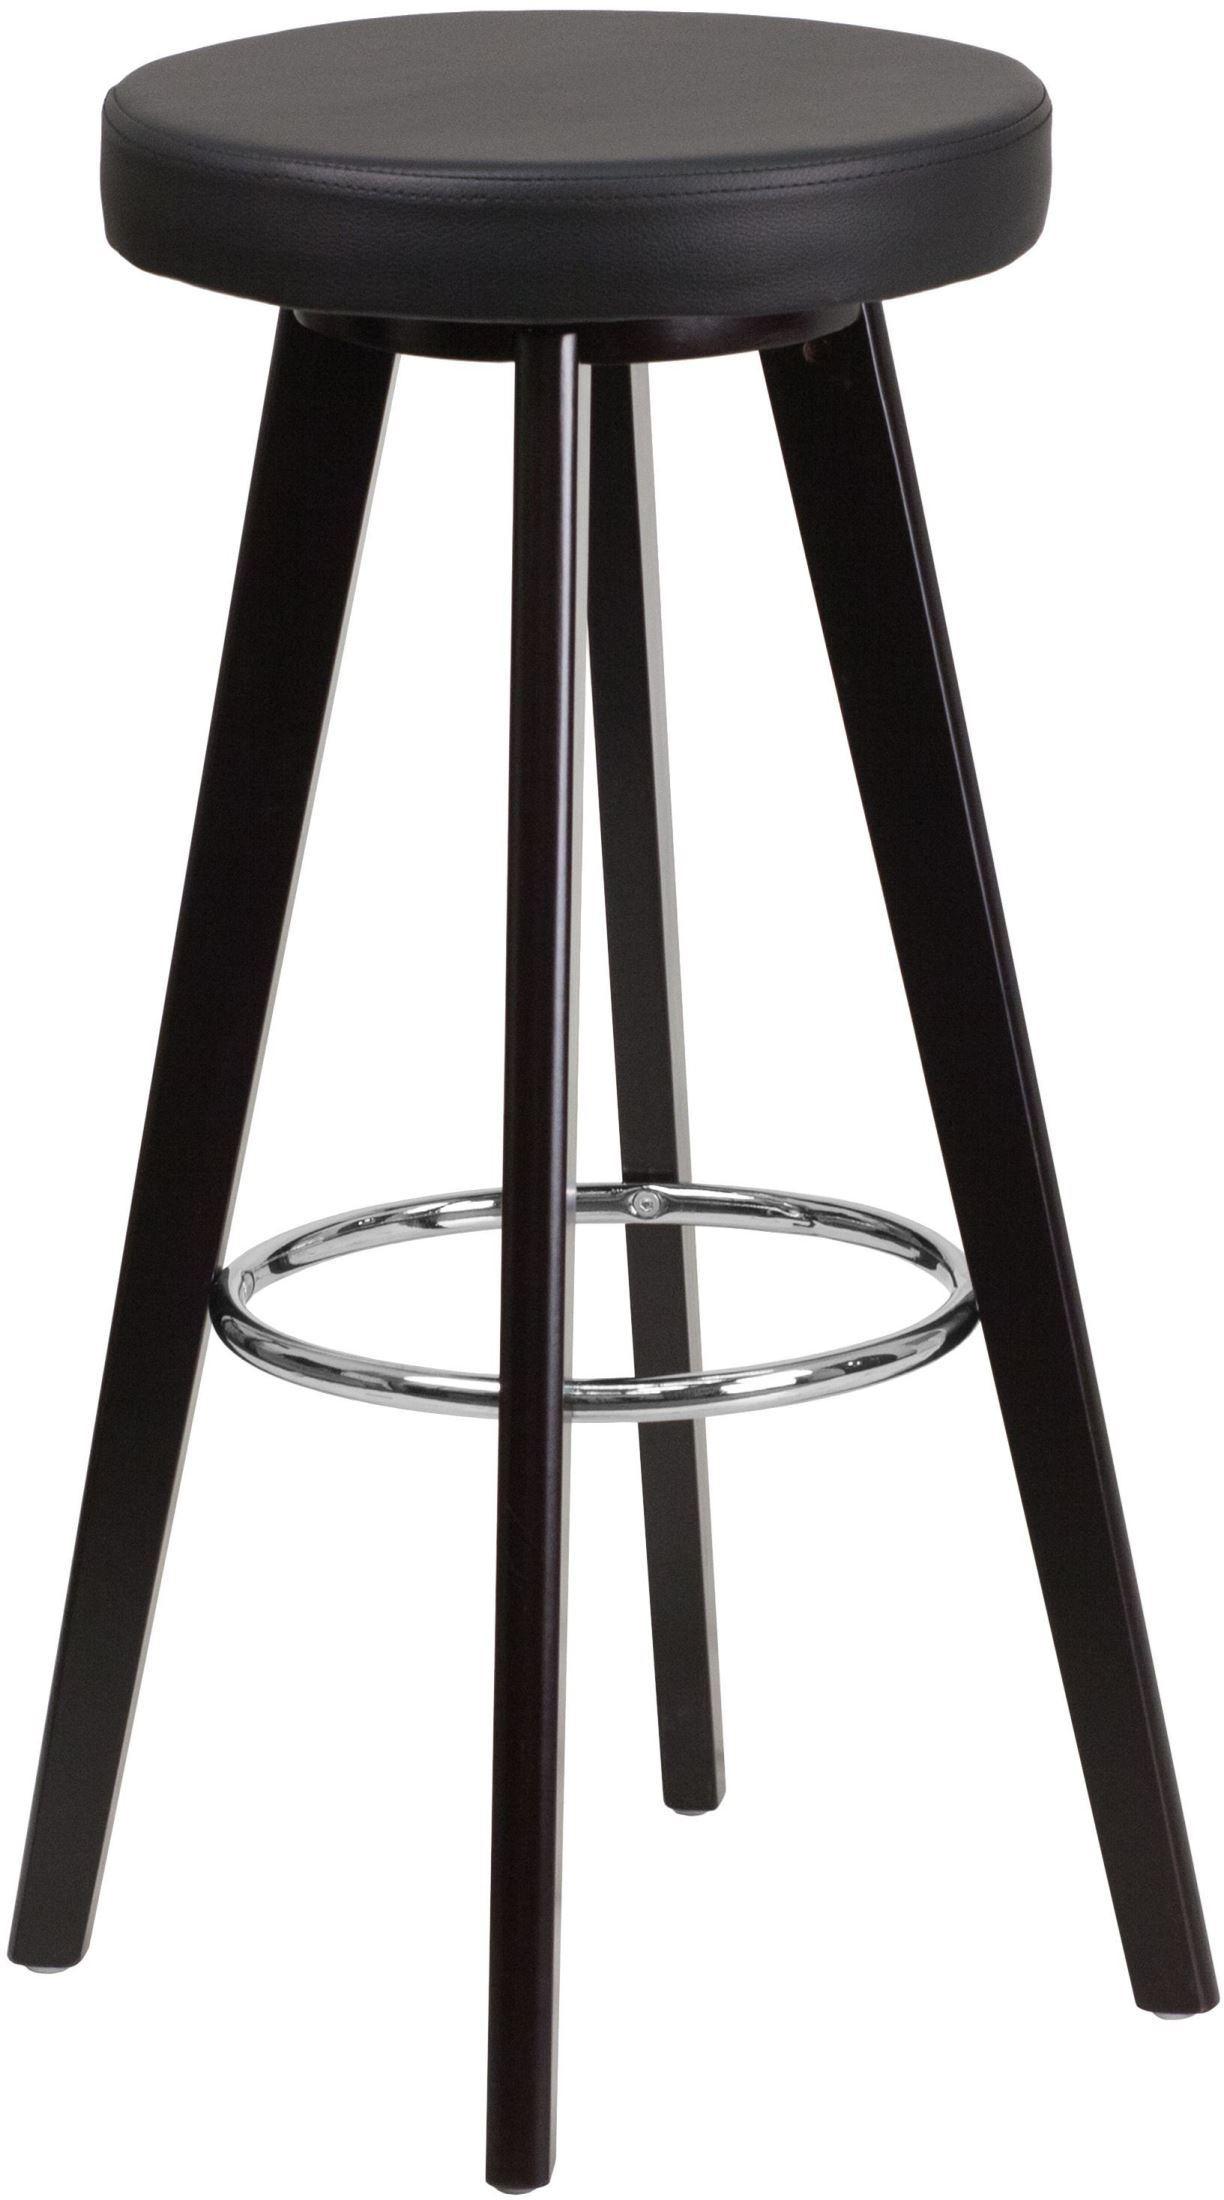 Trenton Series 29inch High Contemporary Black Vinyl Bar